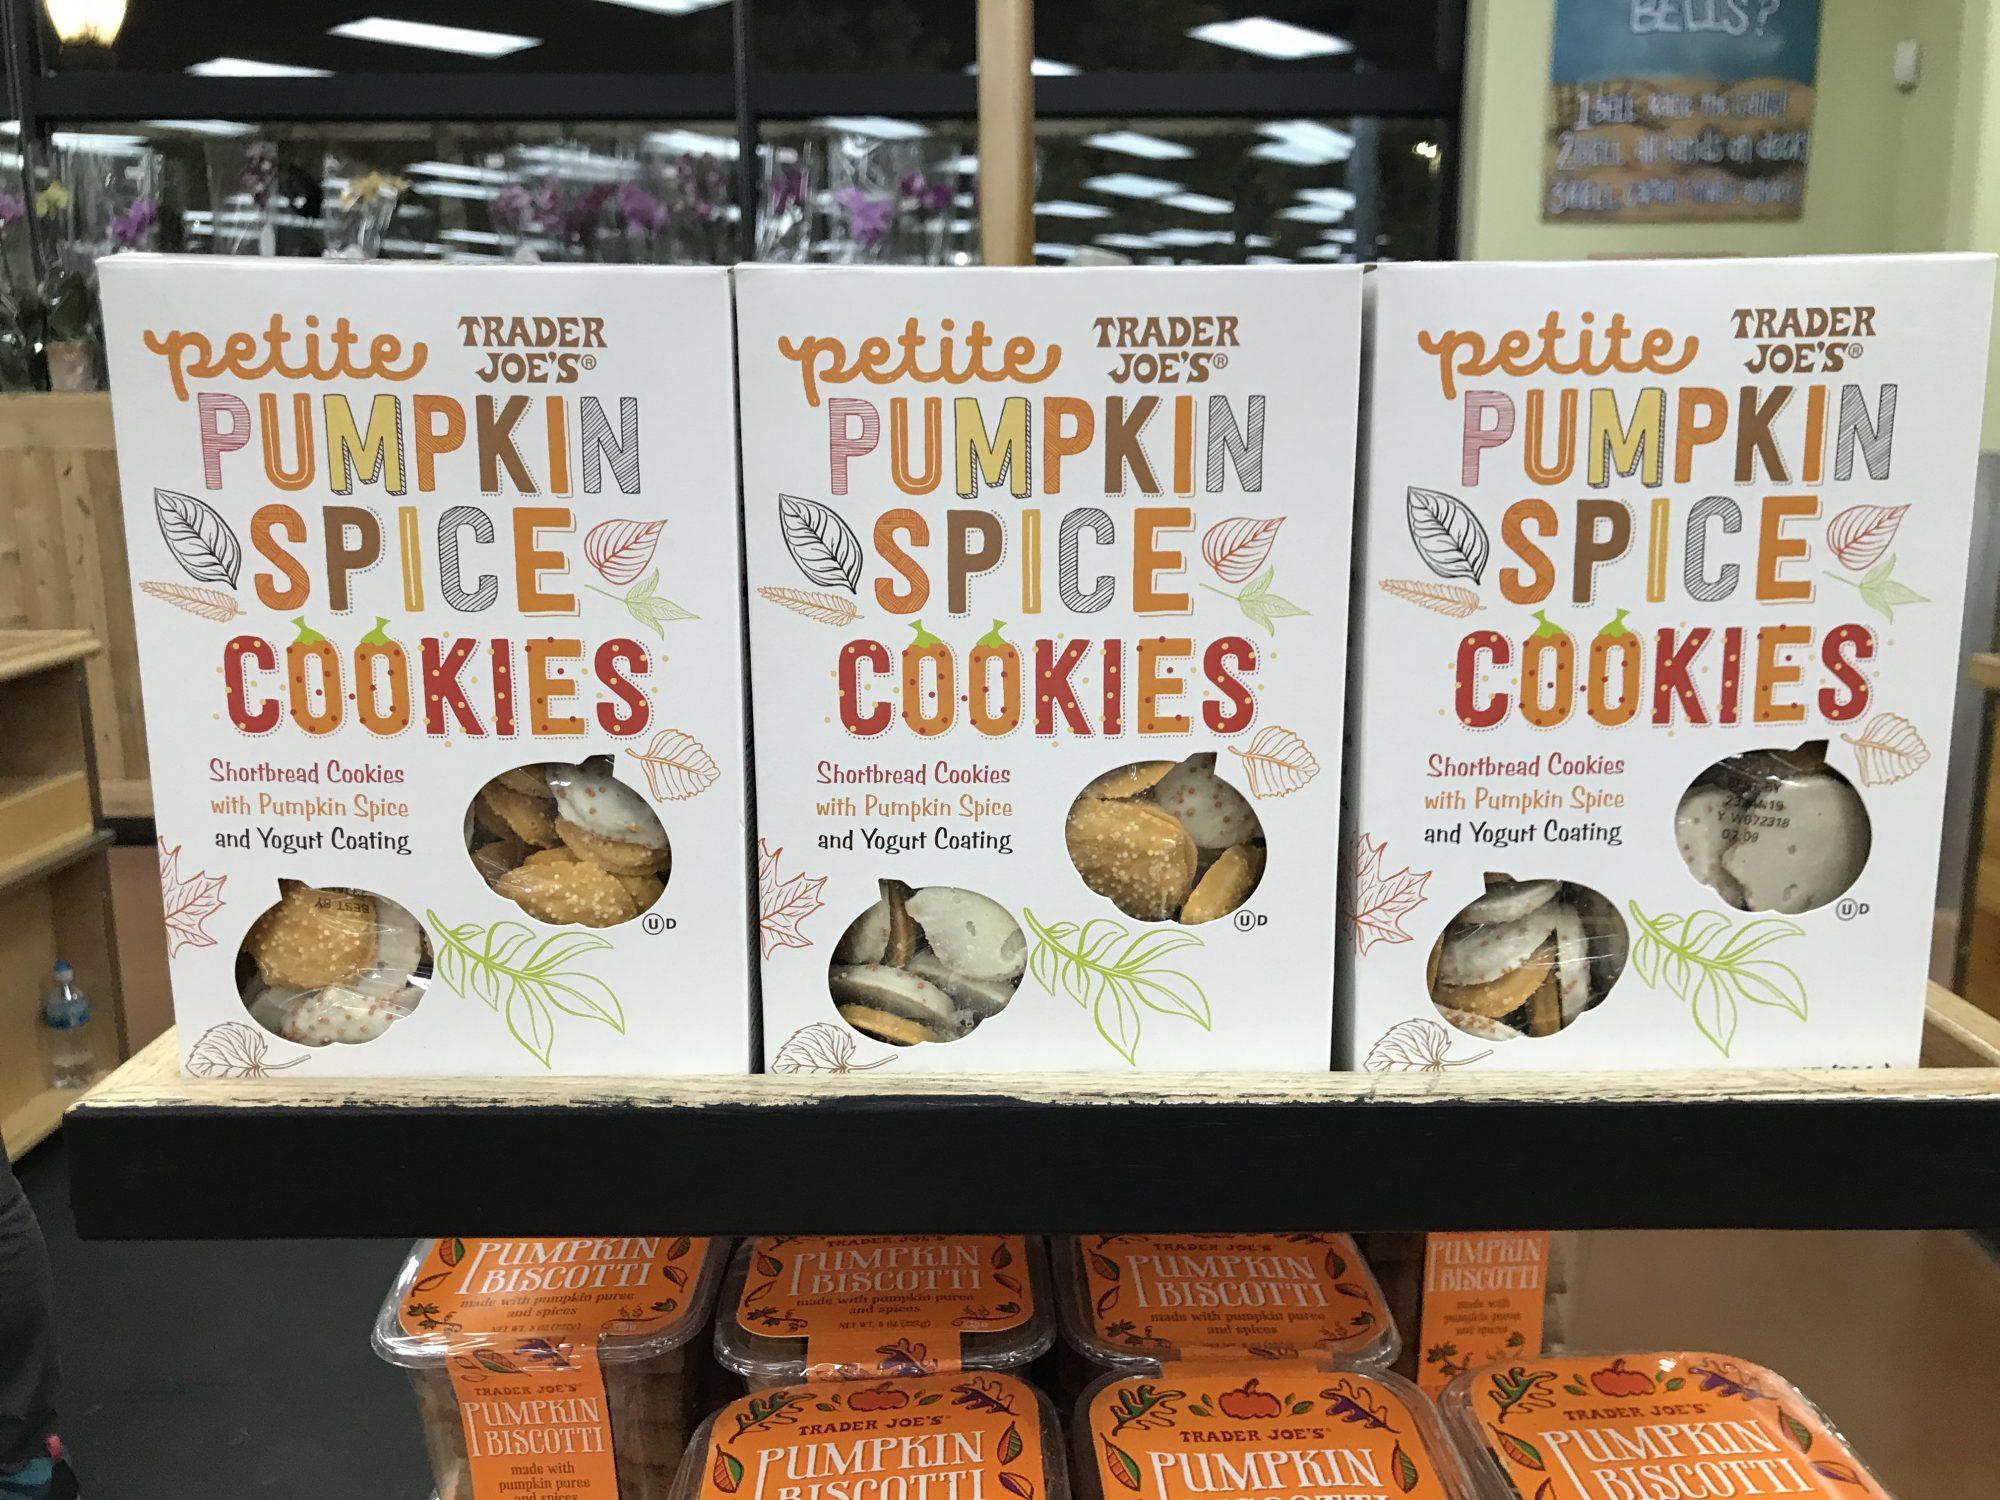 TJ's Pumpkin Spice Cookies